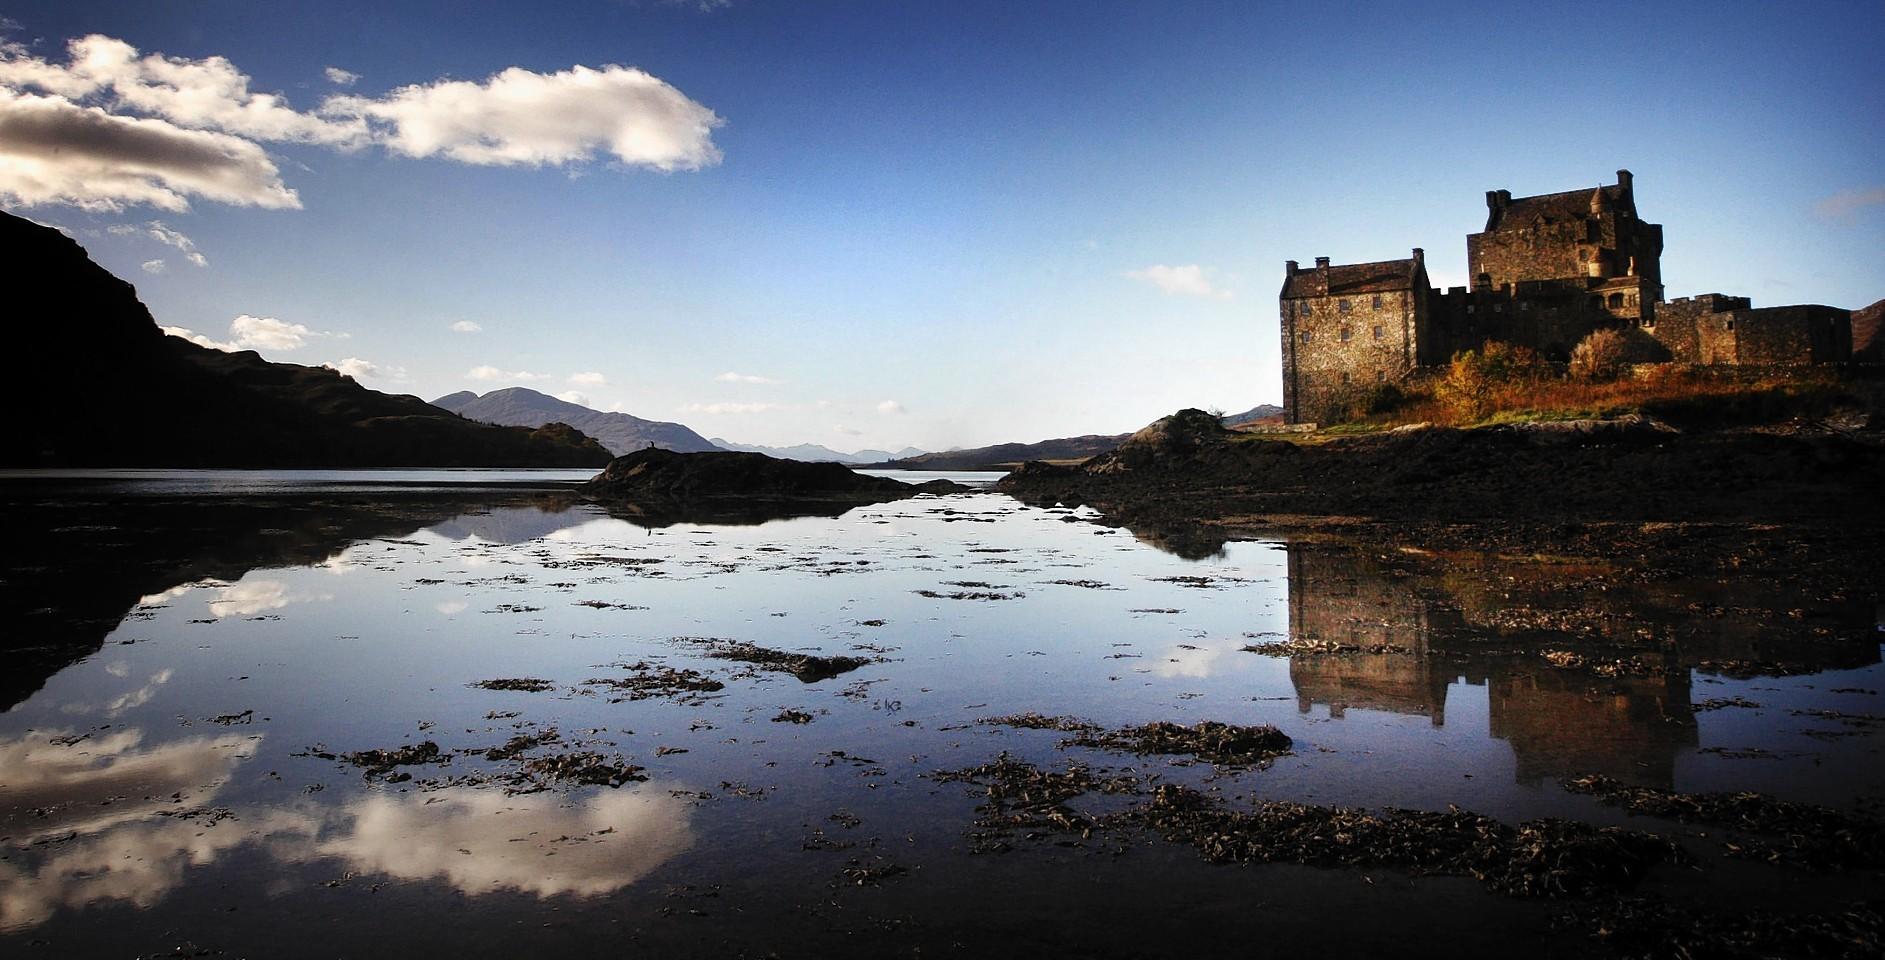 Eilean Donan Castle in Loch Duich. Credit: Danny Lawson.